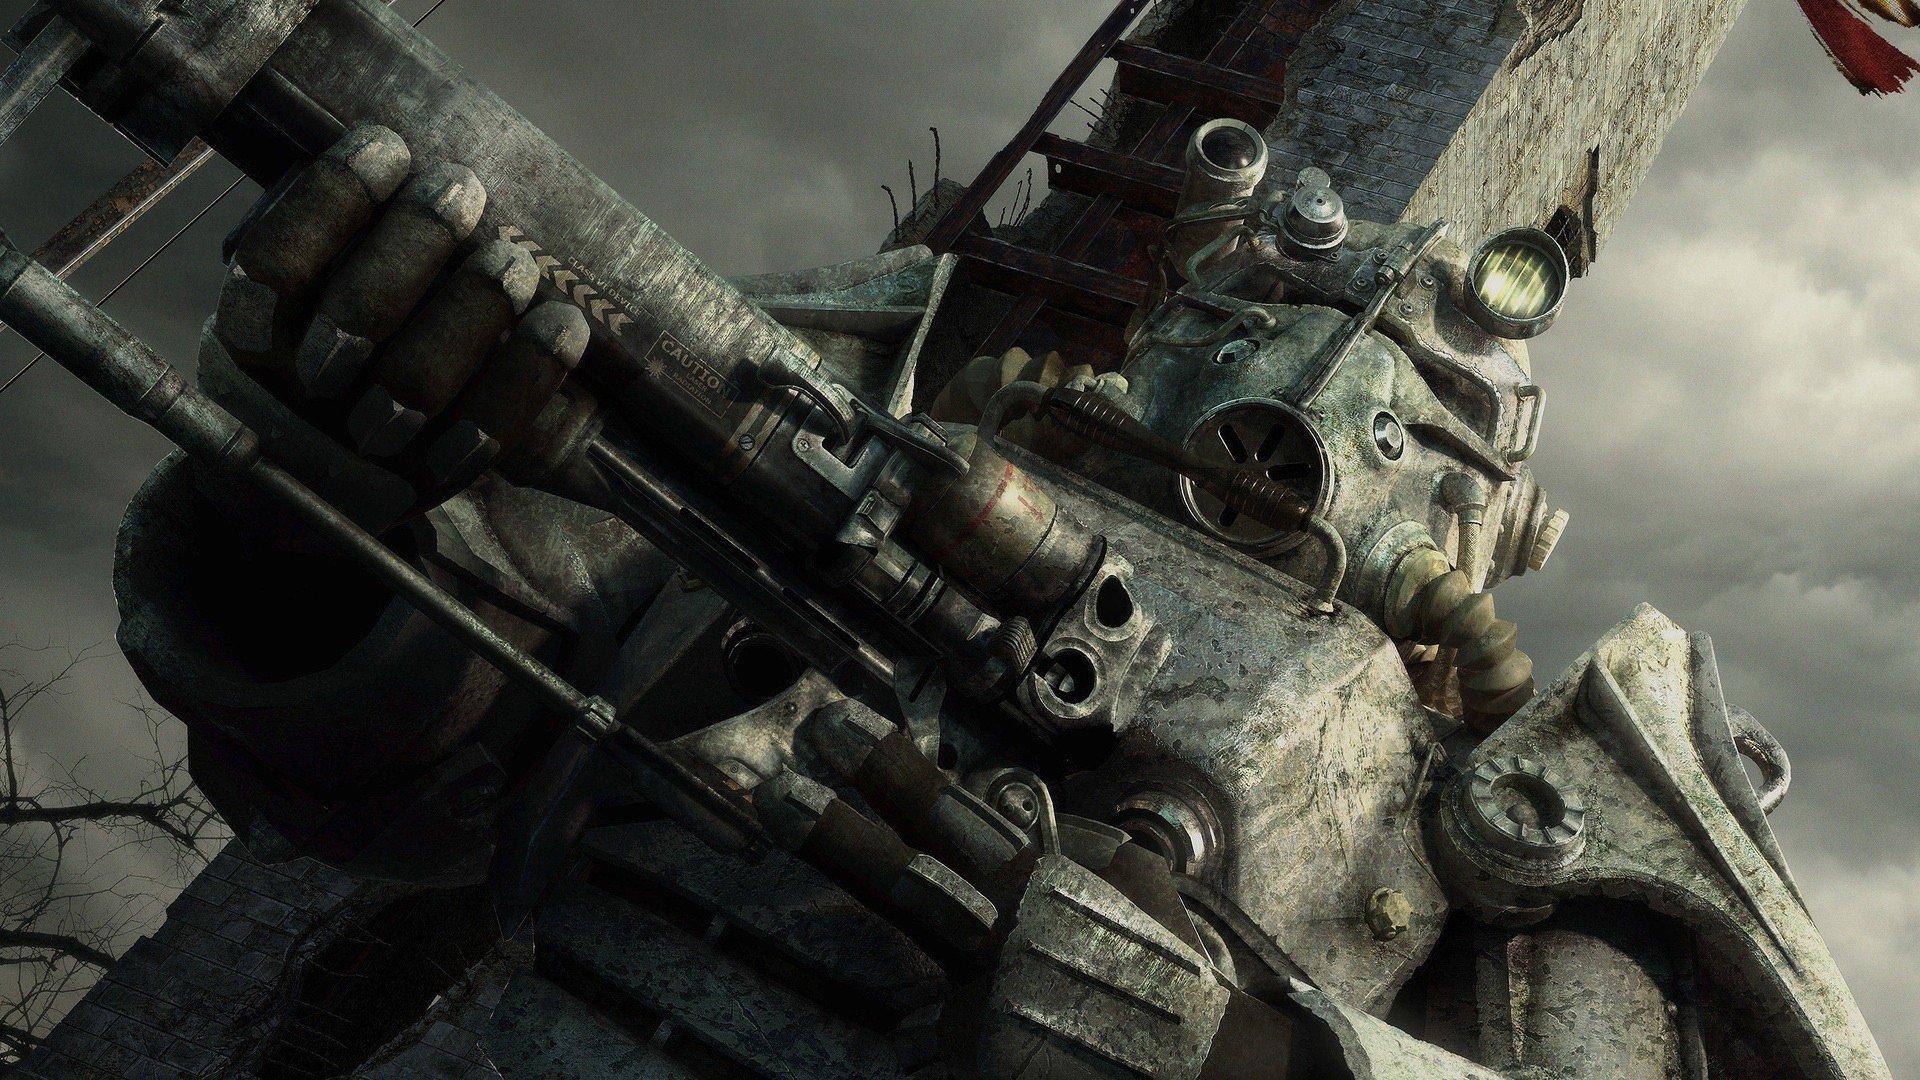 video games fallout cgi brotherhood of steel fallout 3